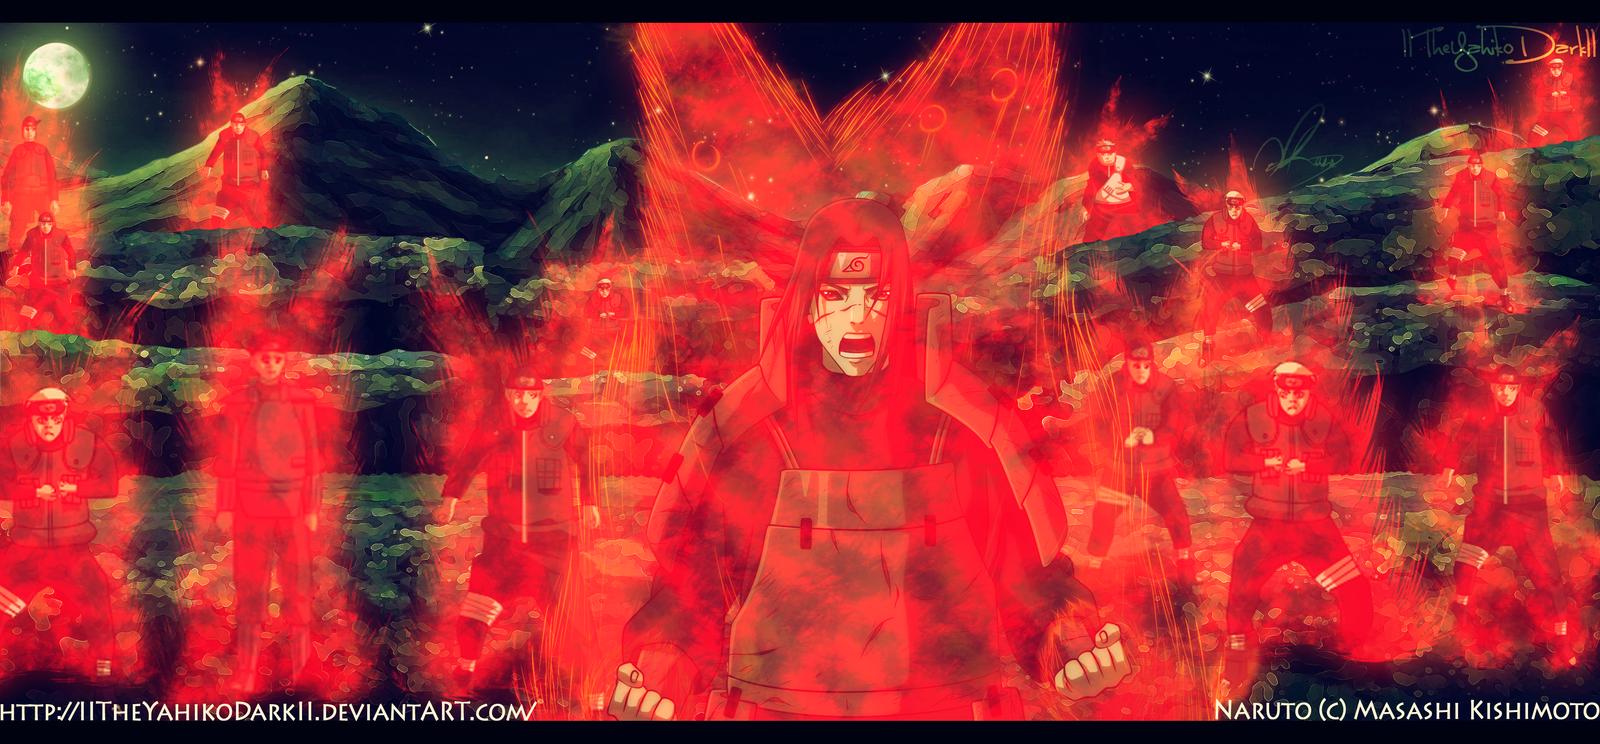 Naruto 649 All The Force by IITheYahikoDarkII